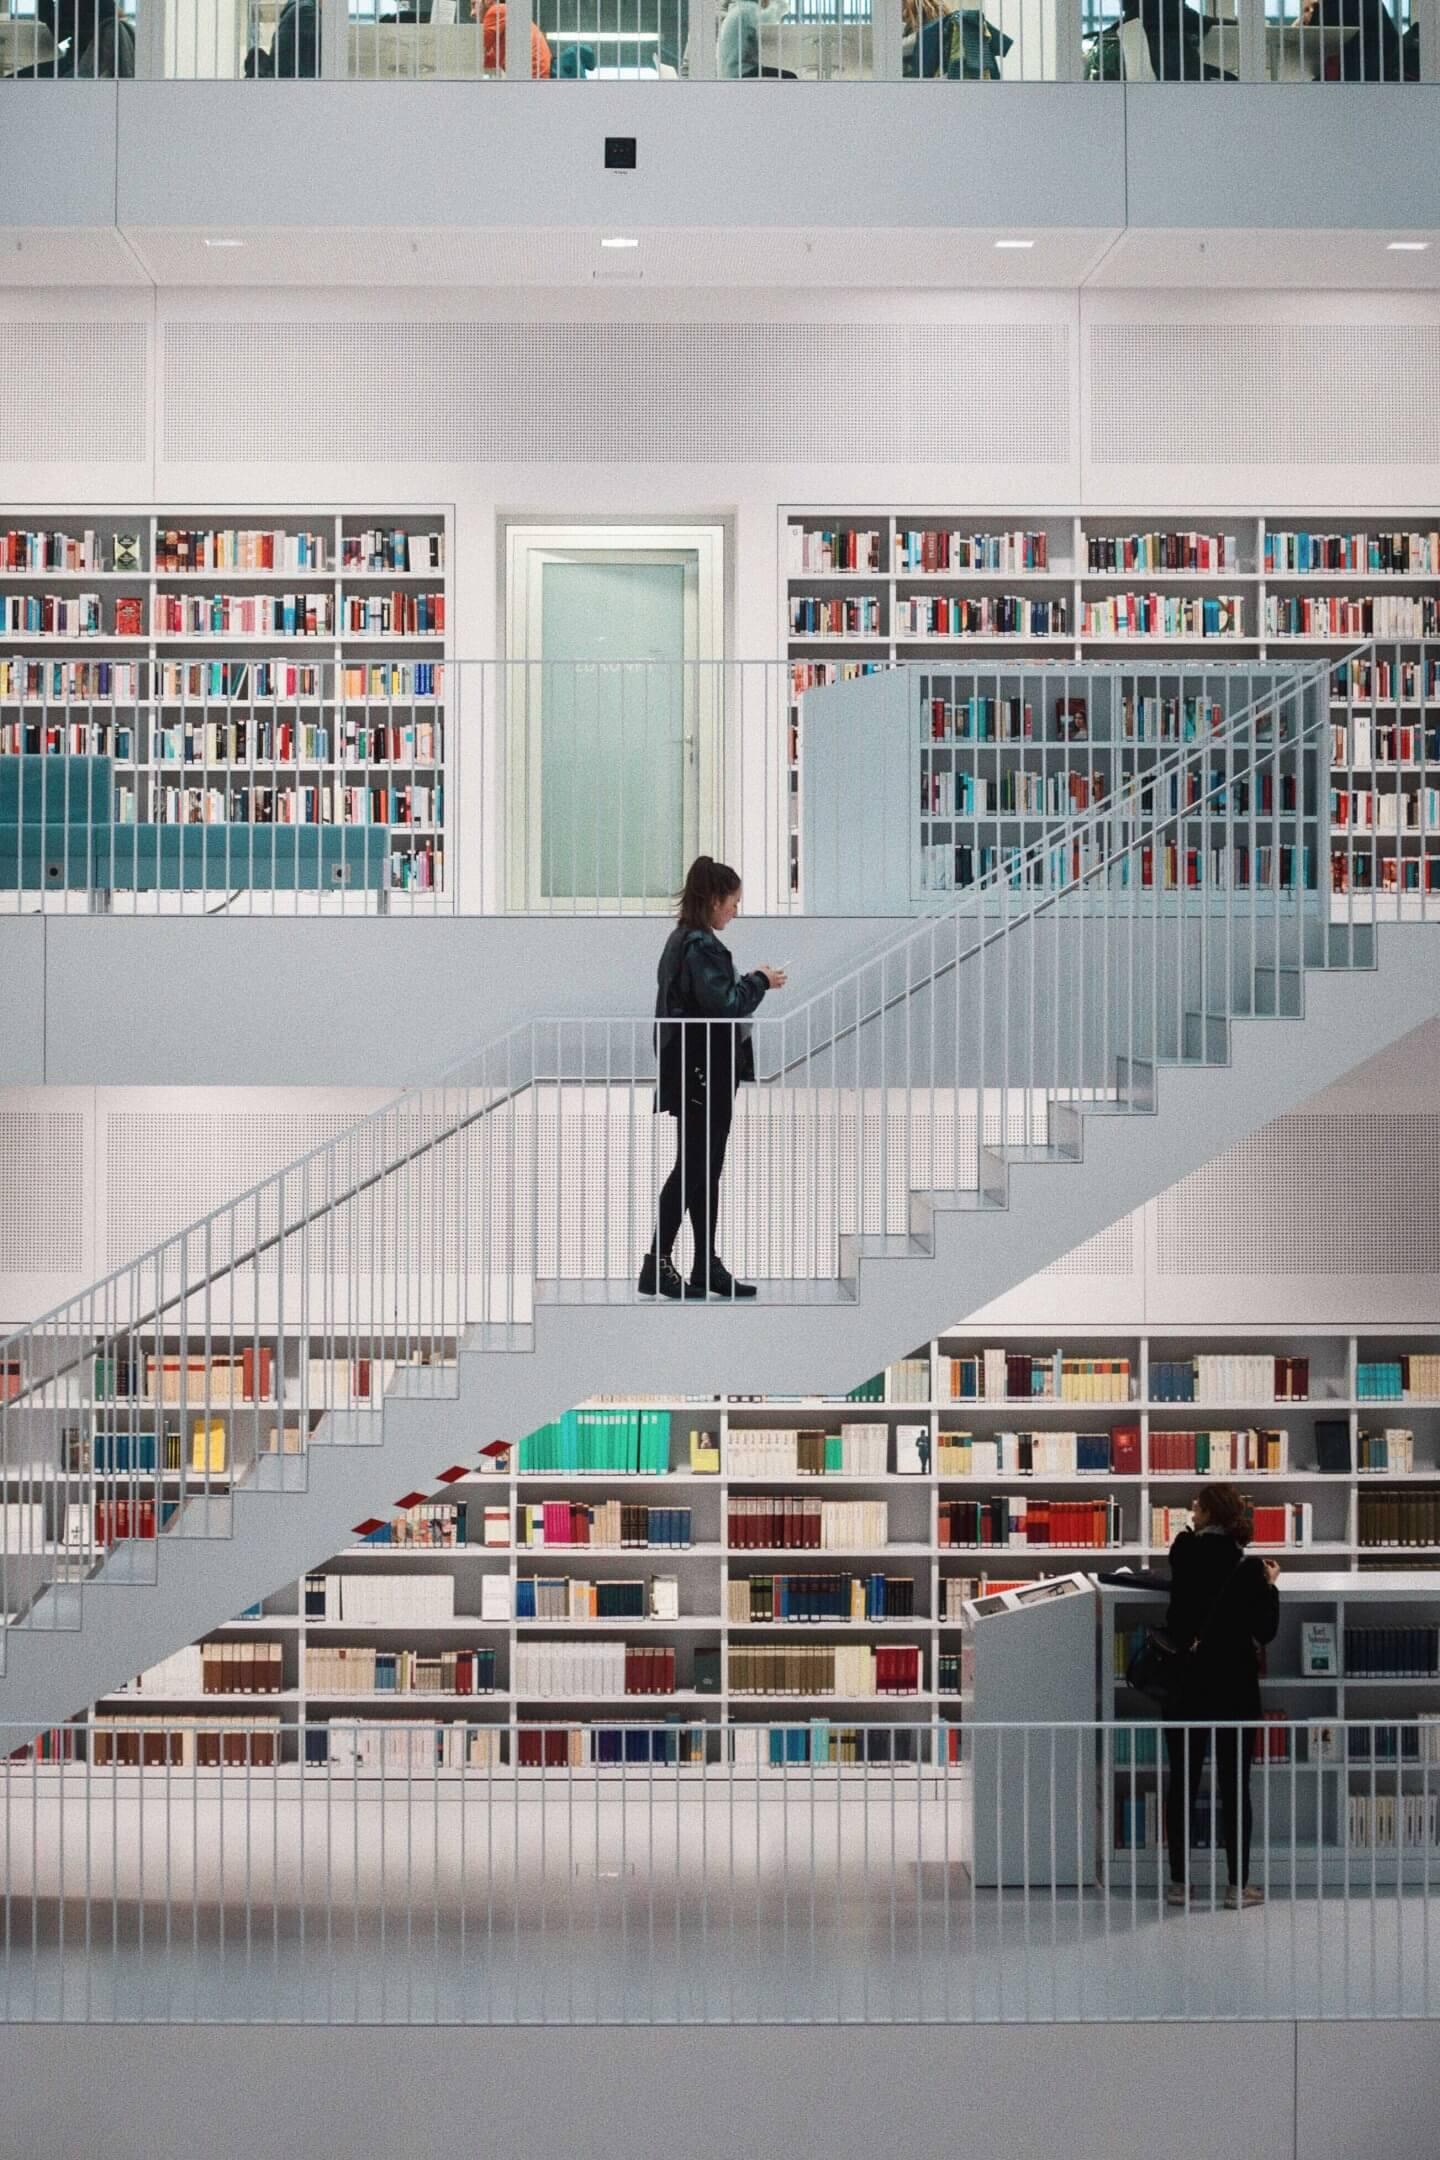 doandlive-studium-crossmedia-redaktion-hdm-stuttgart-bibliothek